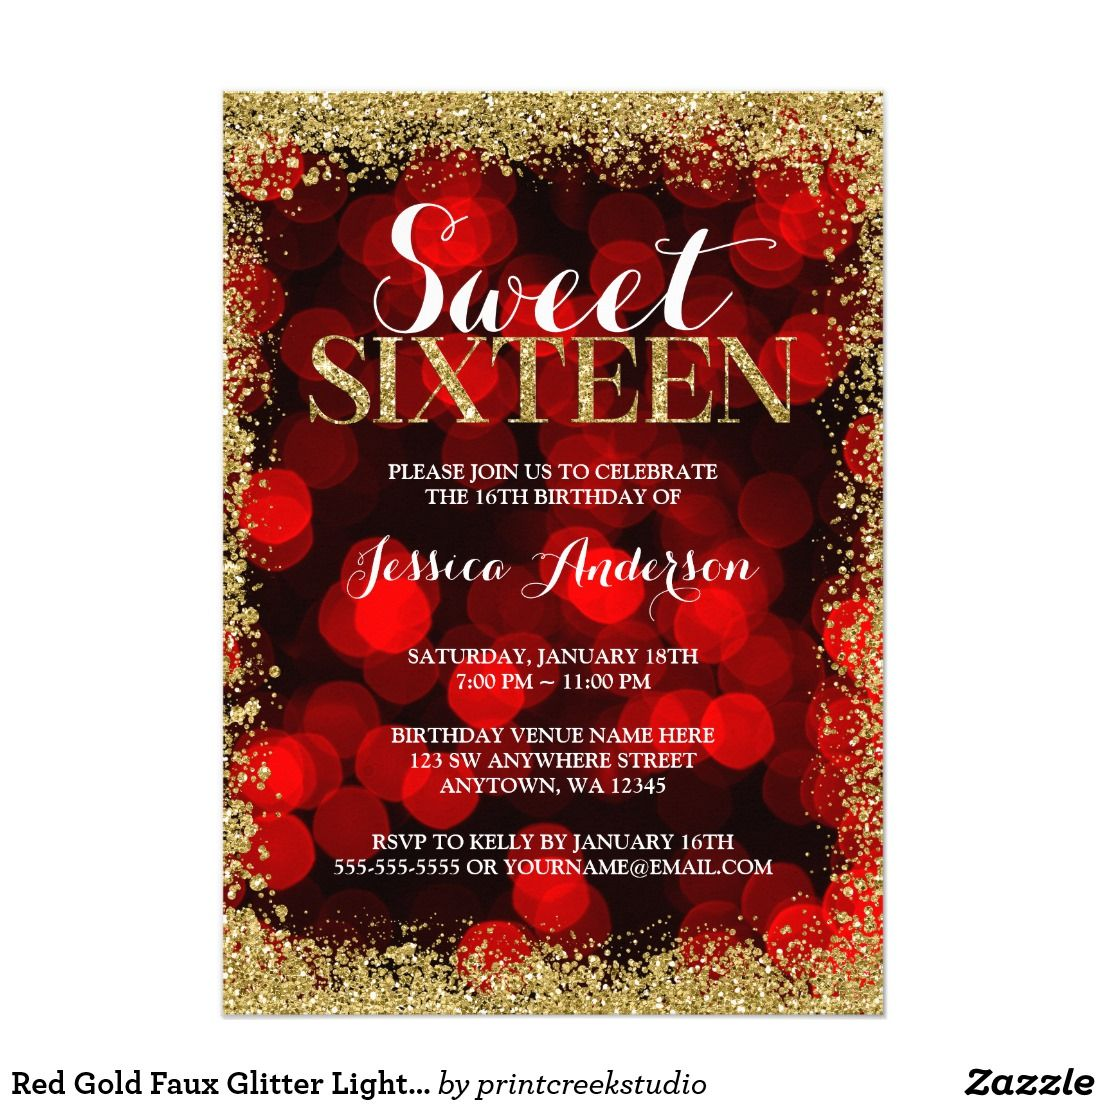 Red Gold Faux Glitter Lights Sweet 16 Birthday Invitation ...